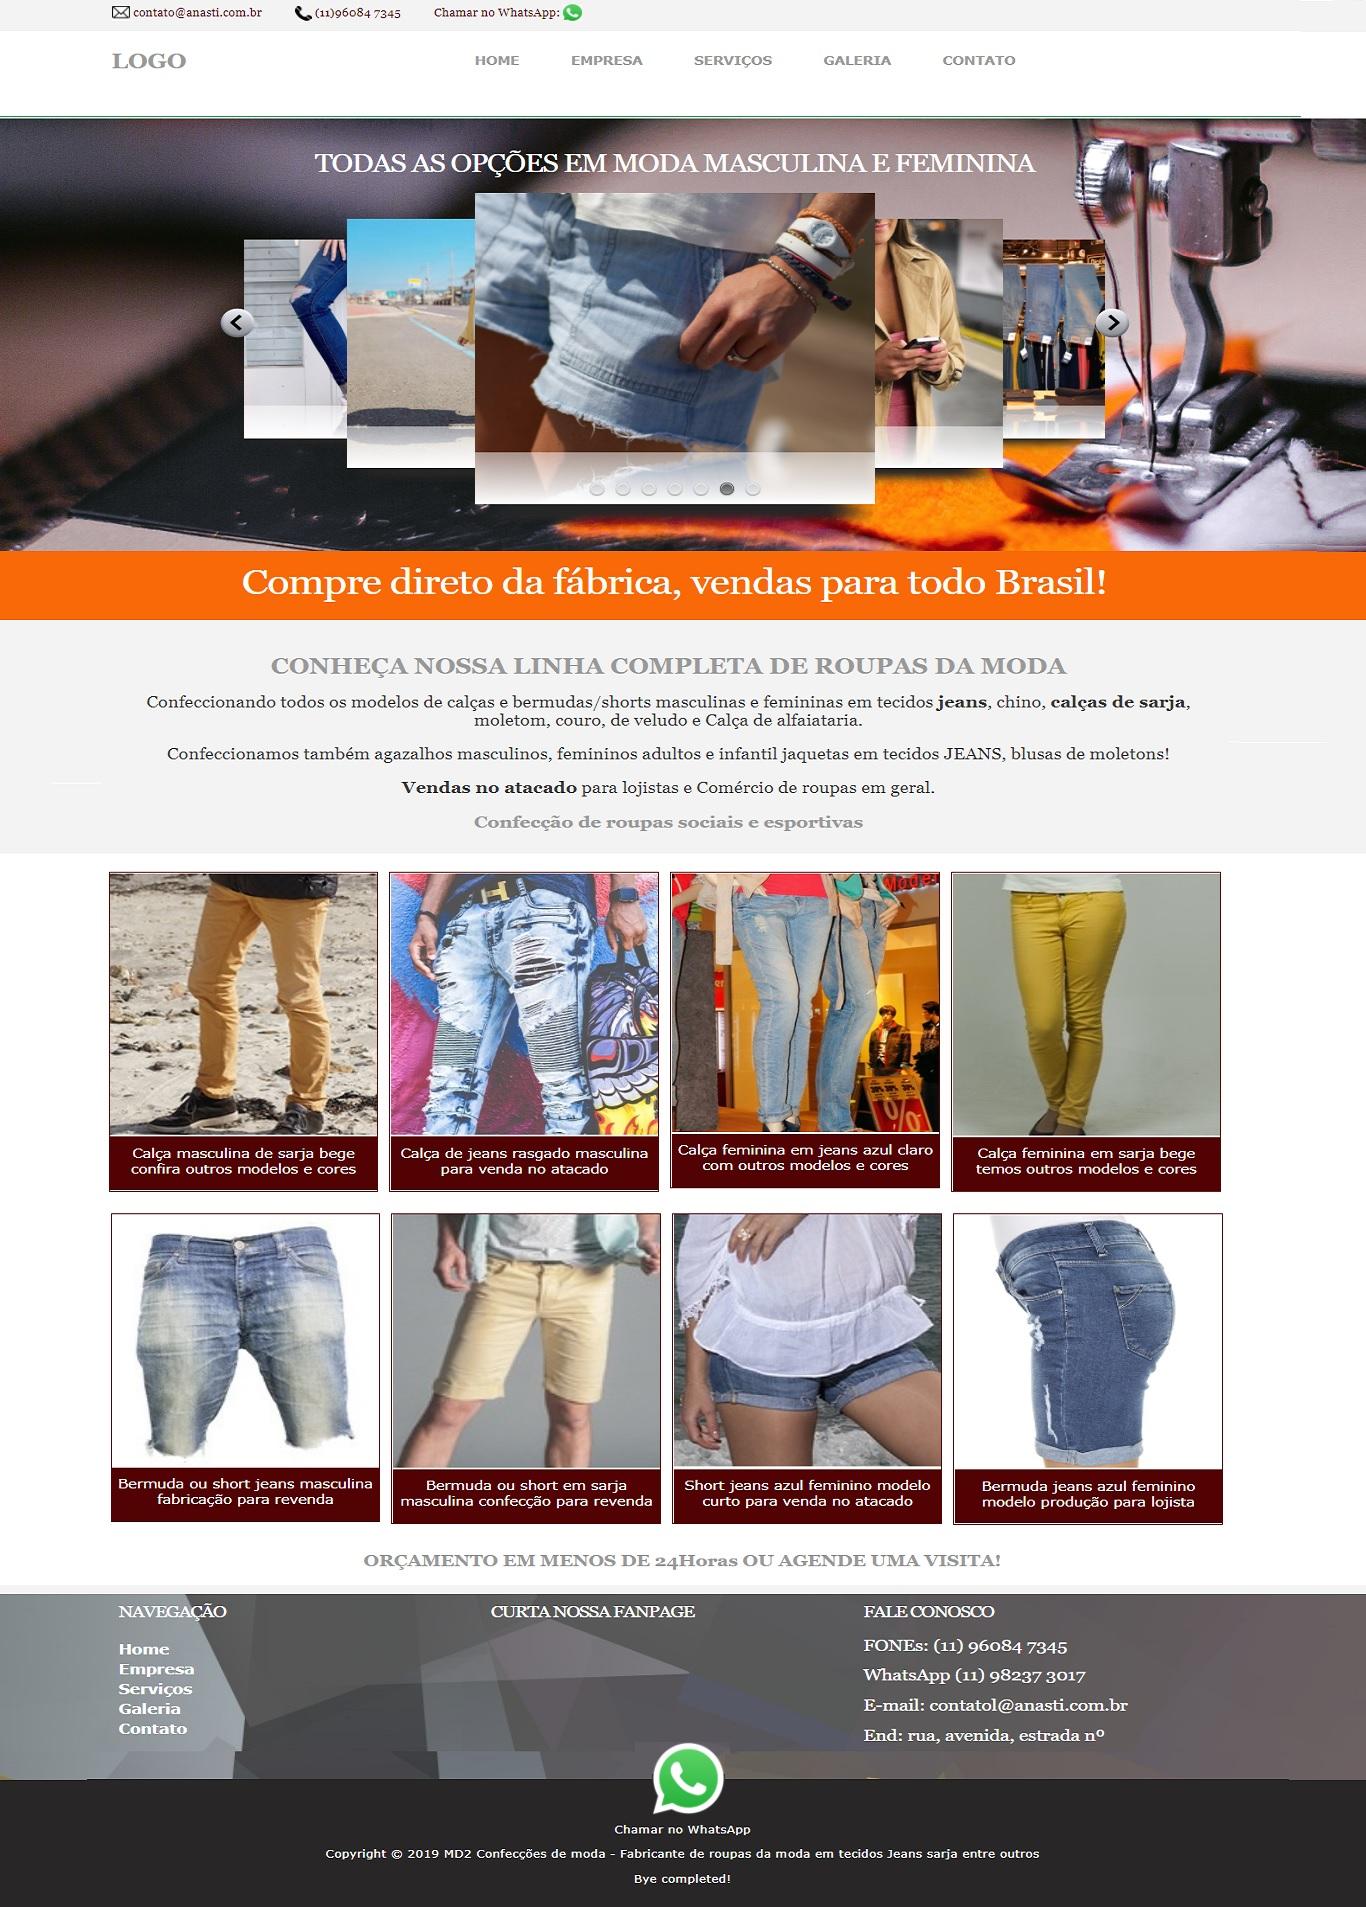 Template de site para confecções oficina de costura Layout simples